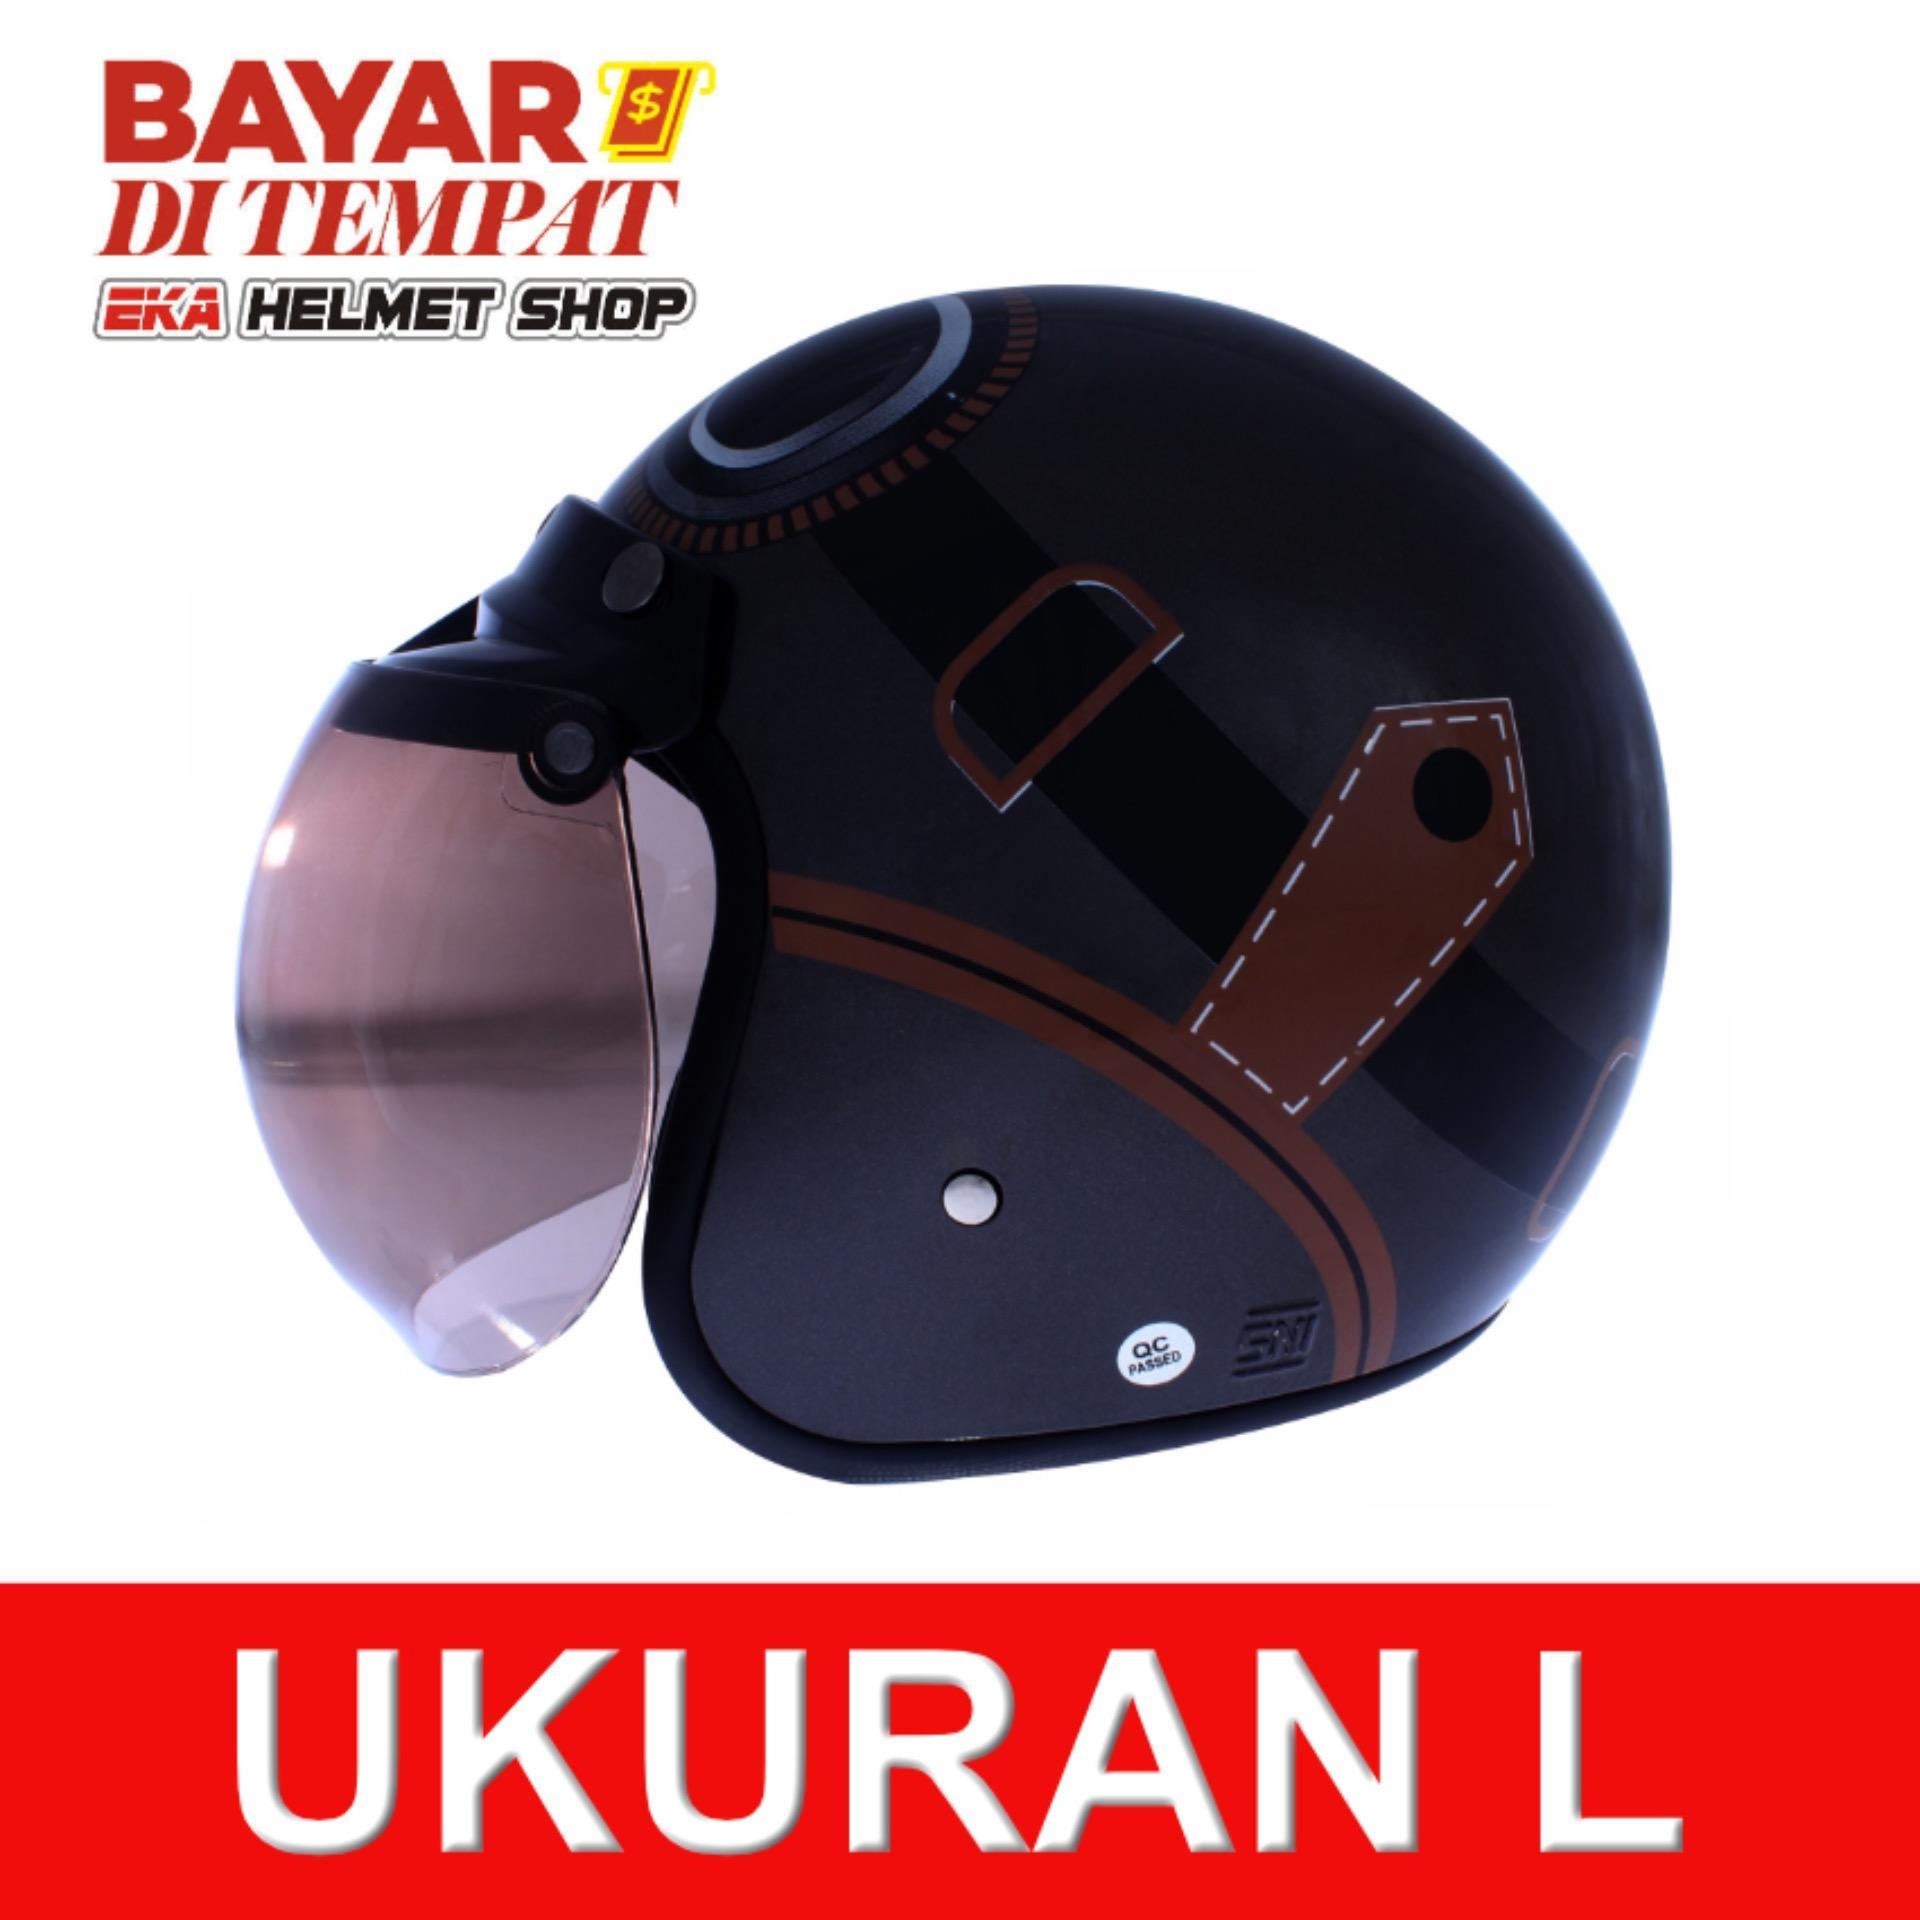 Diskon Wto Helmet Retro K3 Kacamata Abu Abu Cokelat Banten